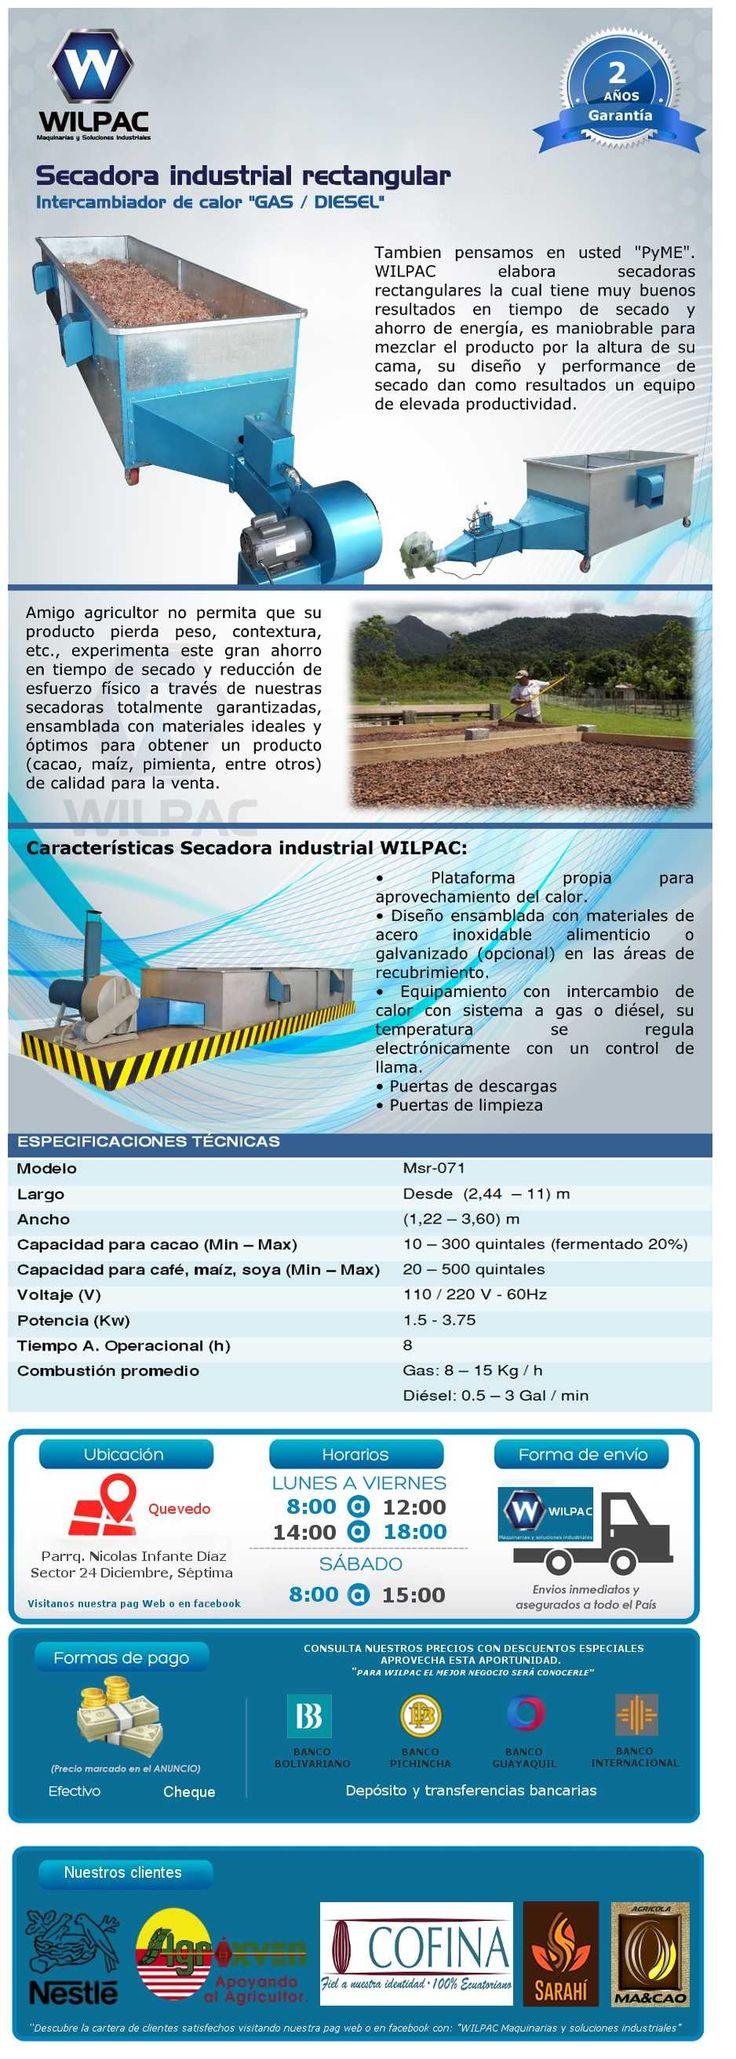 Secadora Cacao Industrial Wilpac Rectangular A Gas / Diesel - U$S 1.989,99